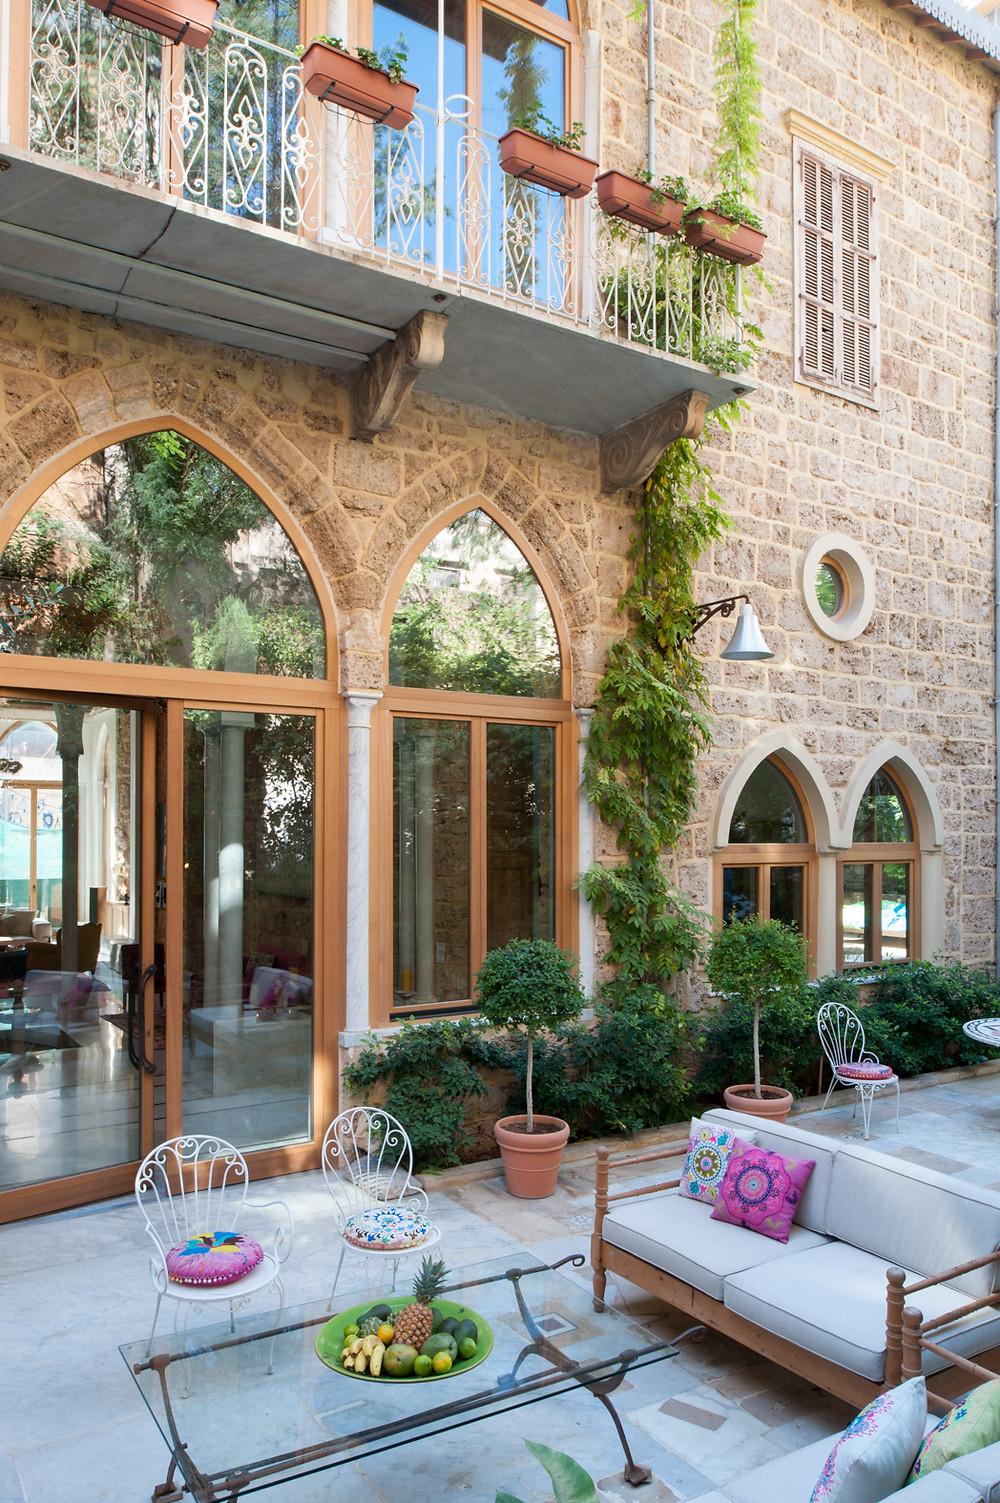 Arthaus Hotel Beirut